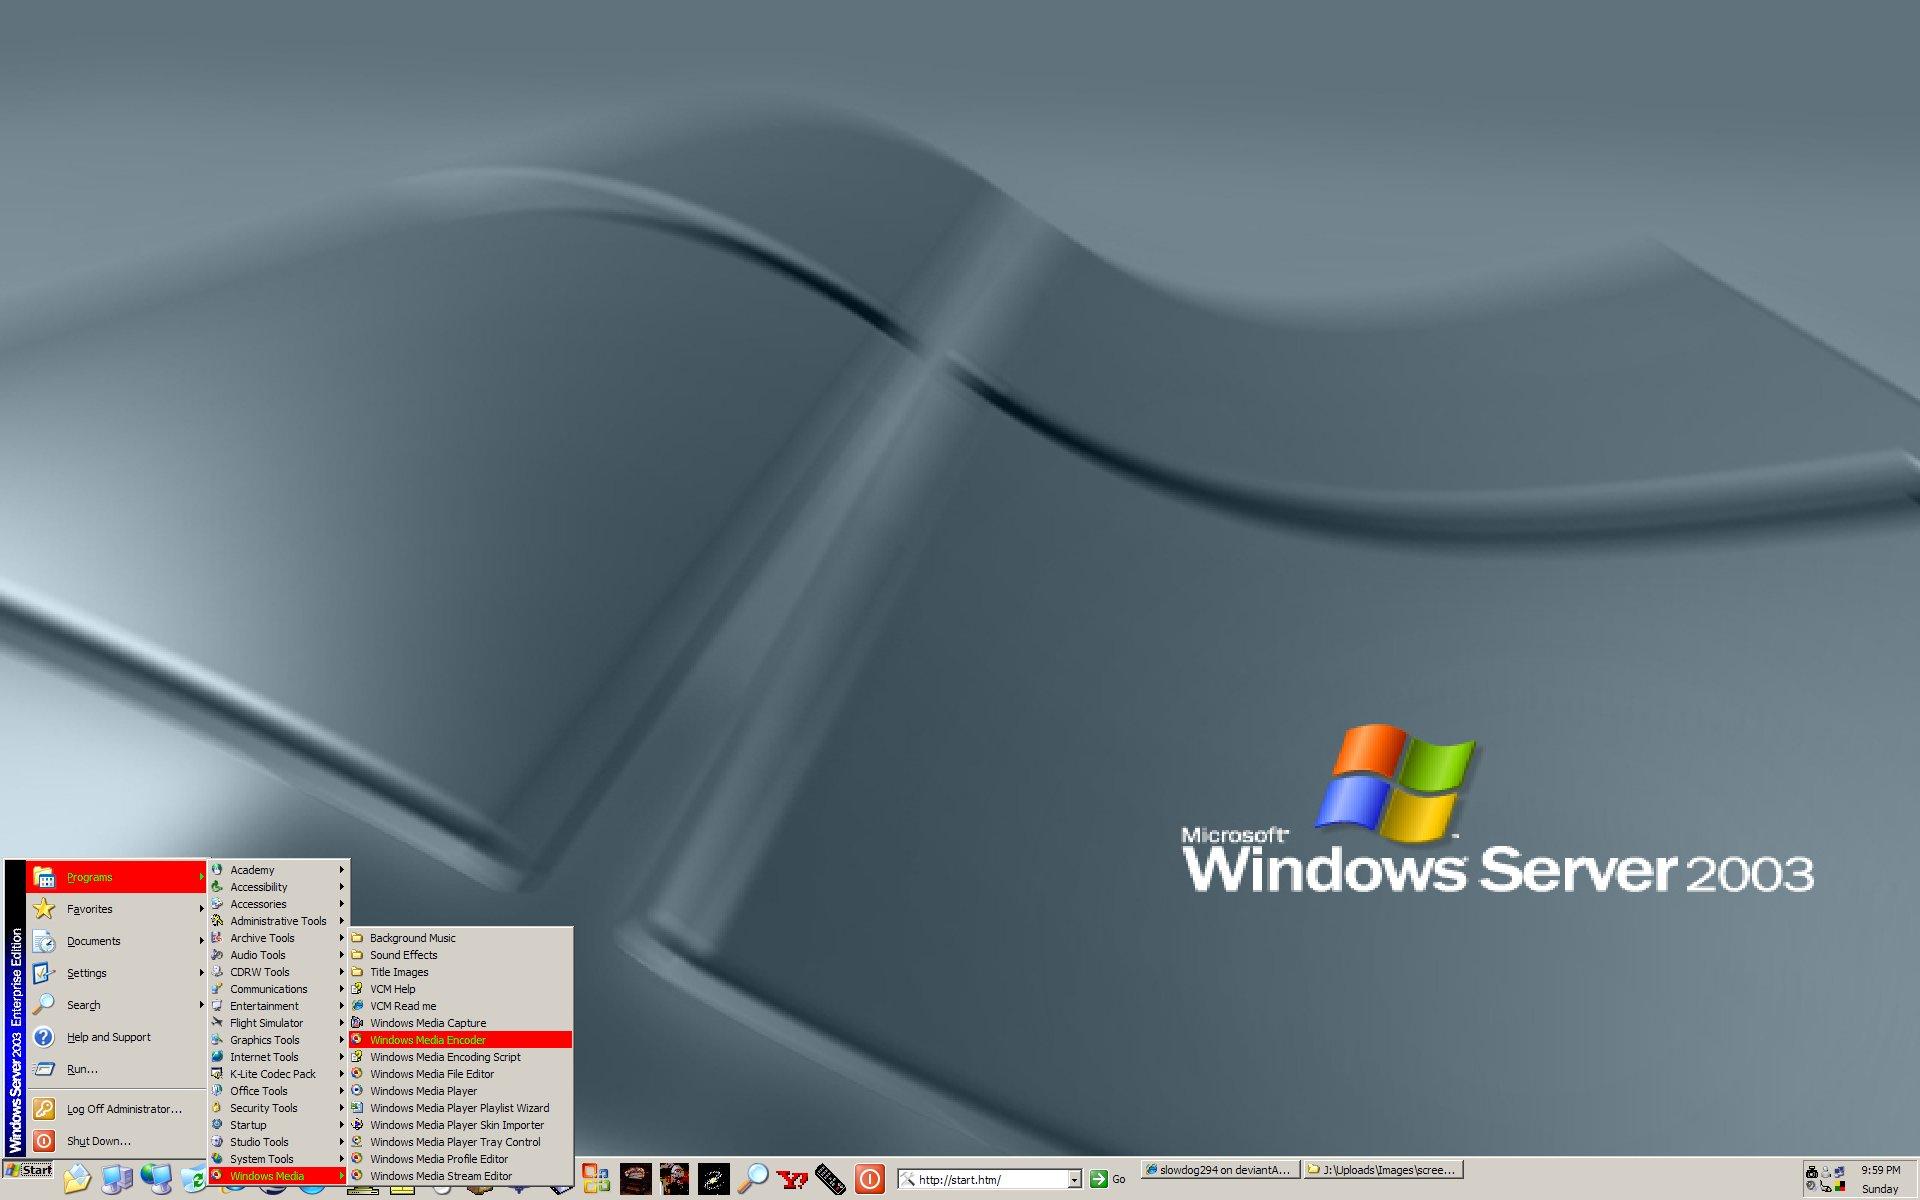 windows server 2003 enterprise service pack 2 iso